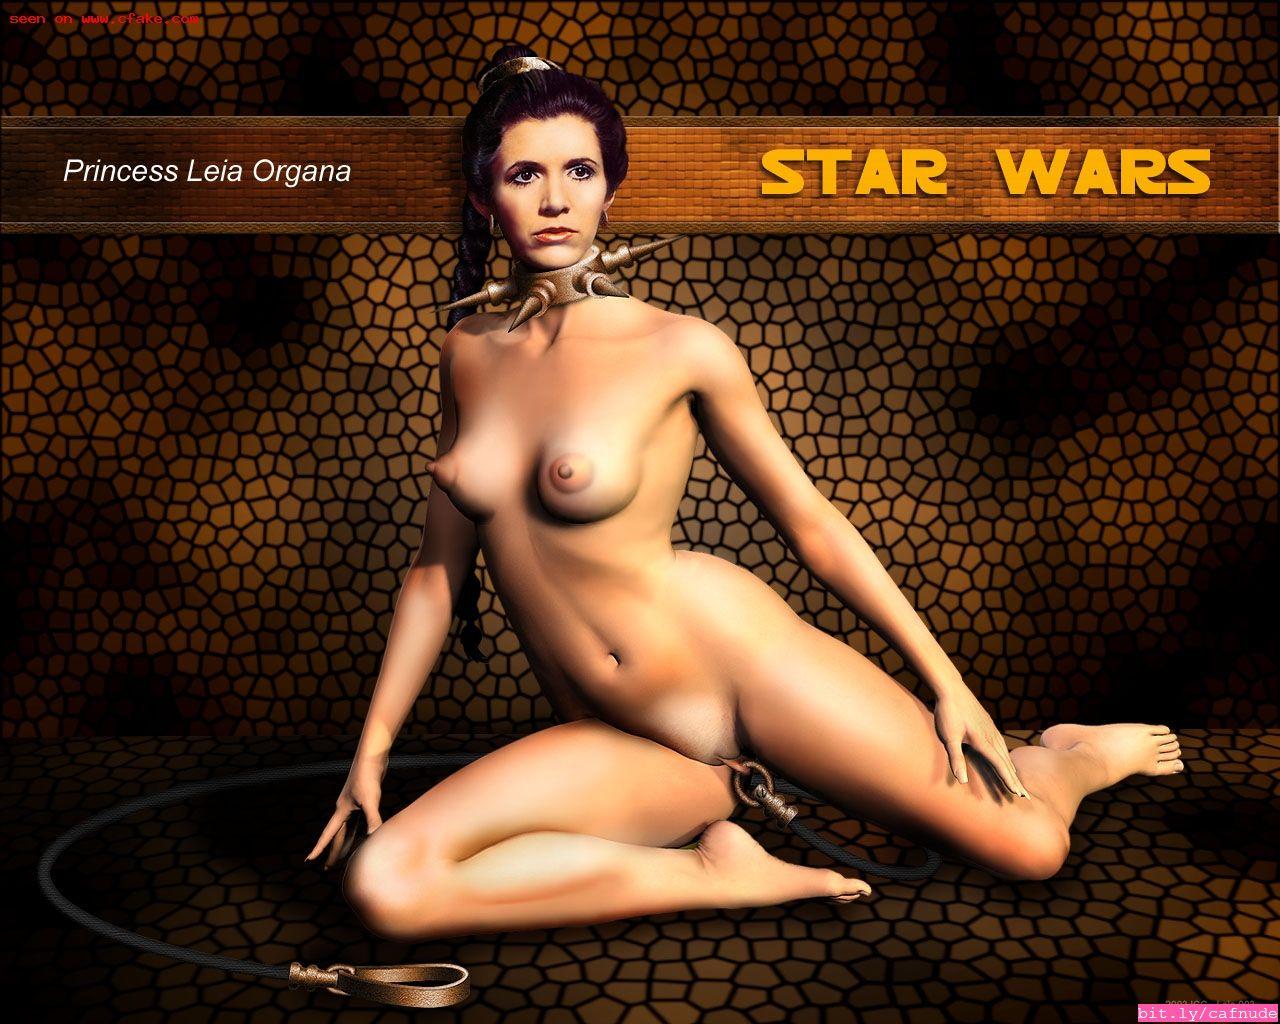 Leia hot pics princess